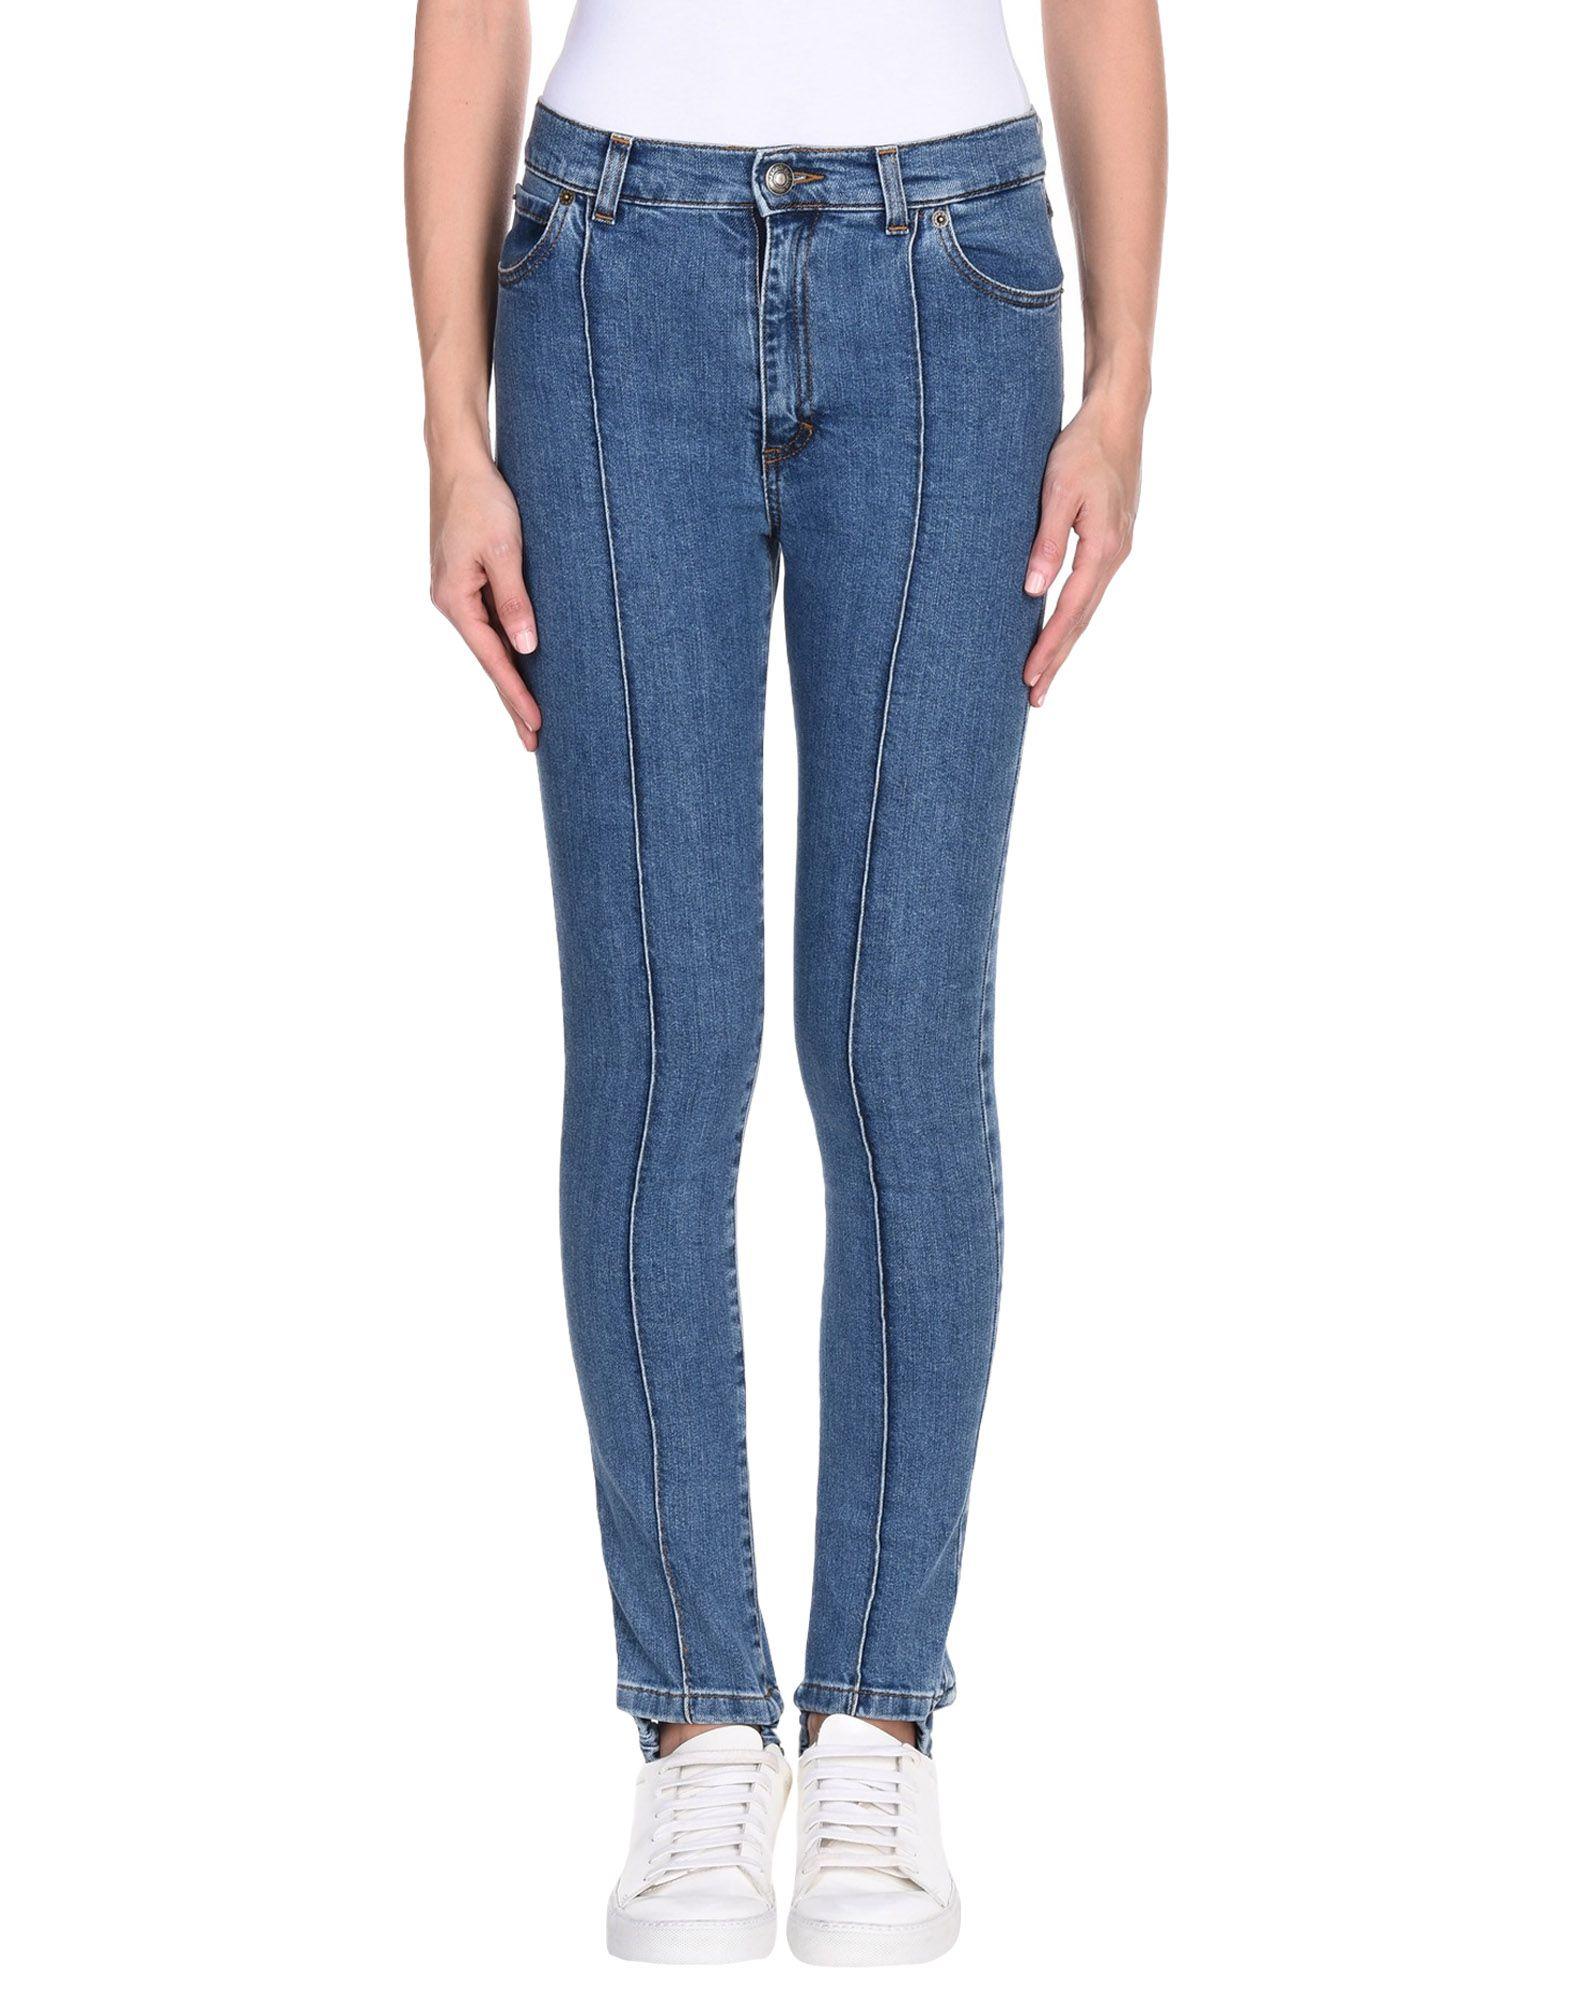 Pantaloni Jeans Magda Butrym Donna - Acquista online su upDVo